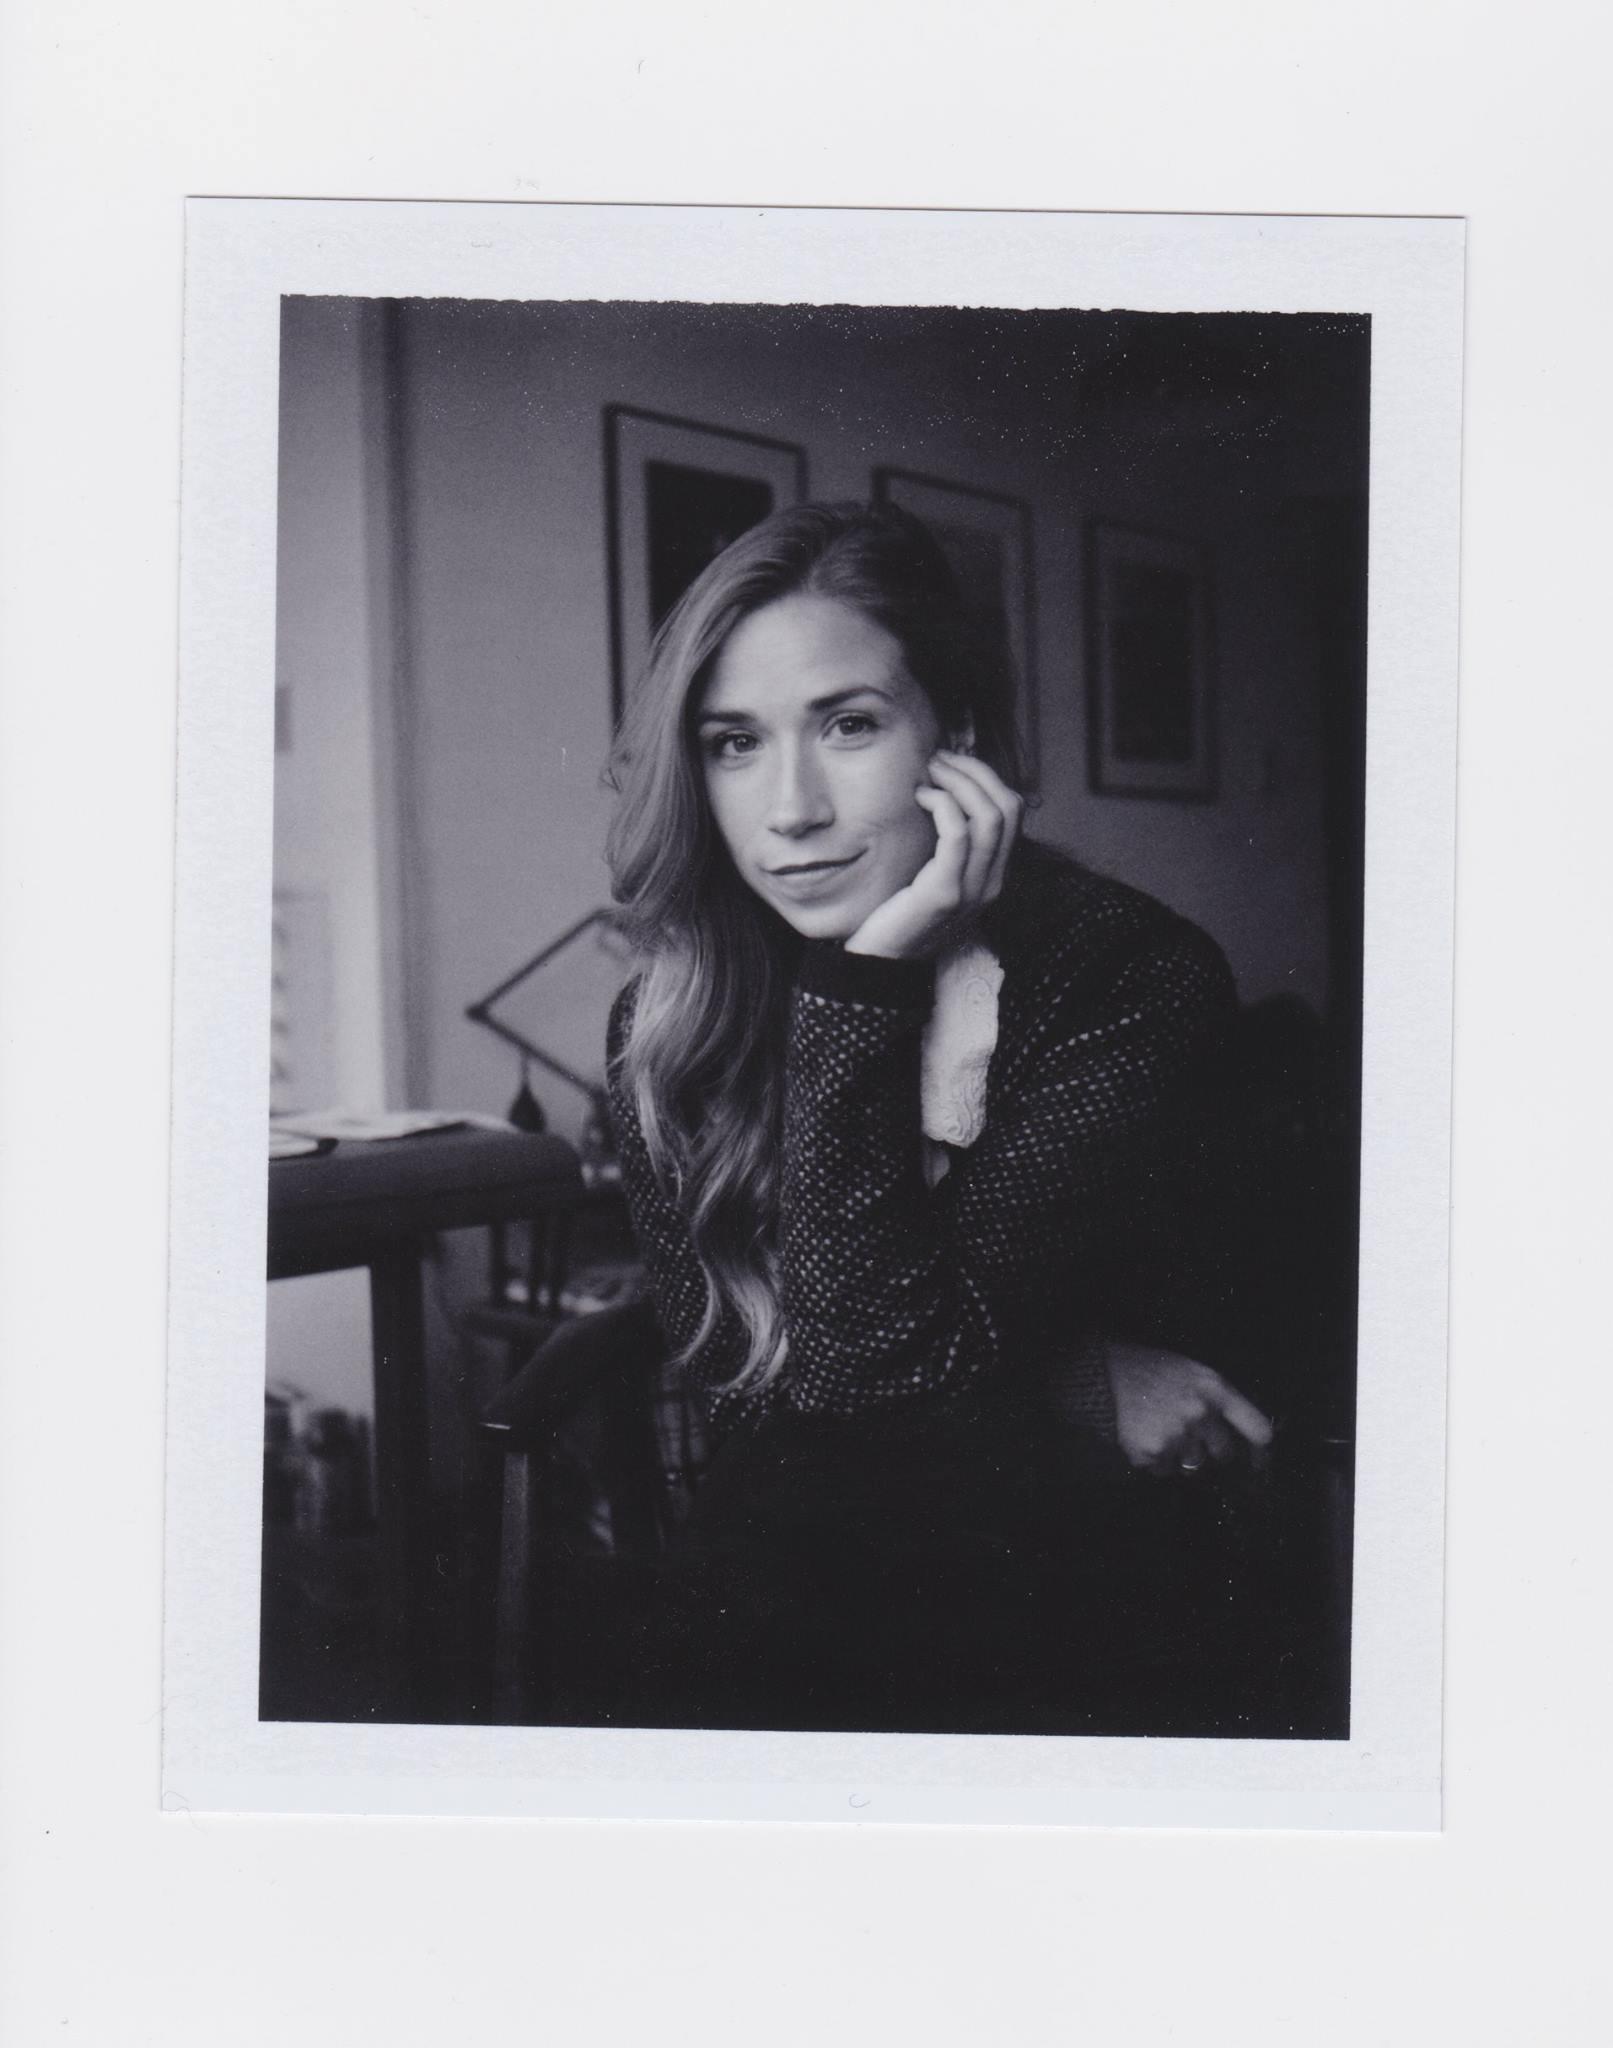 Author Kayley Vandenberg. Photo by Nelson Mouëllic